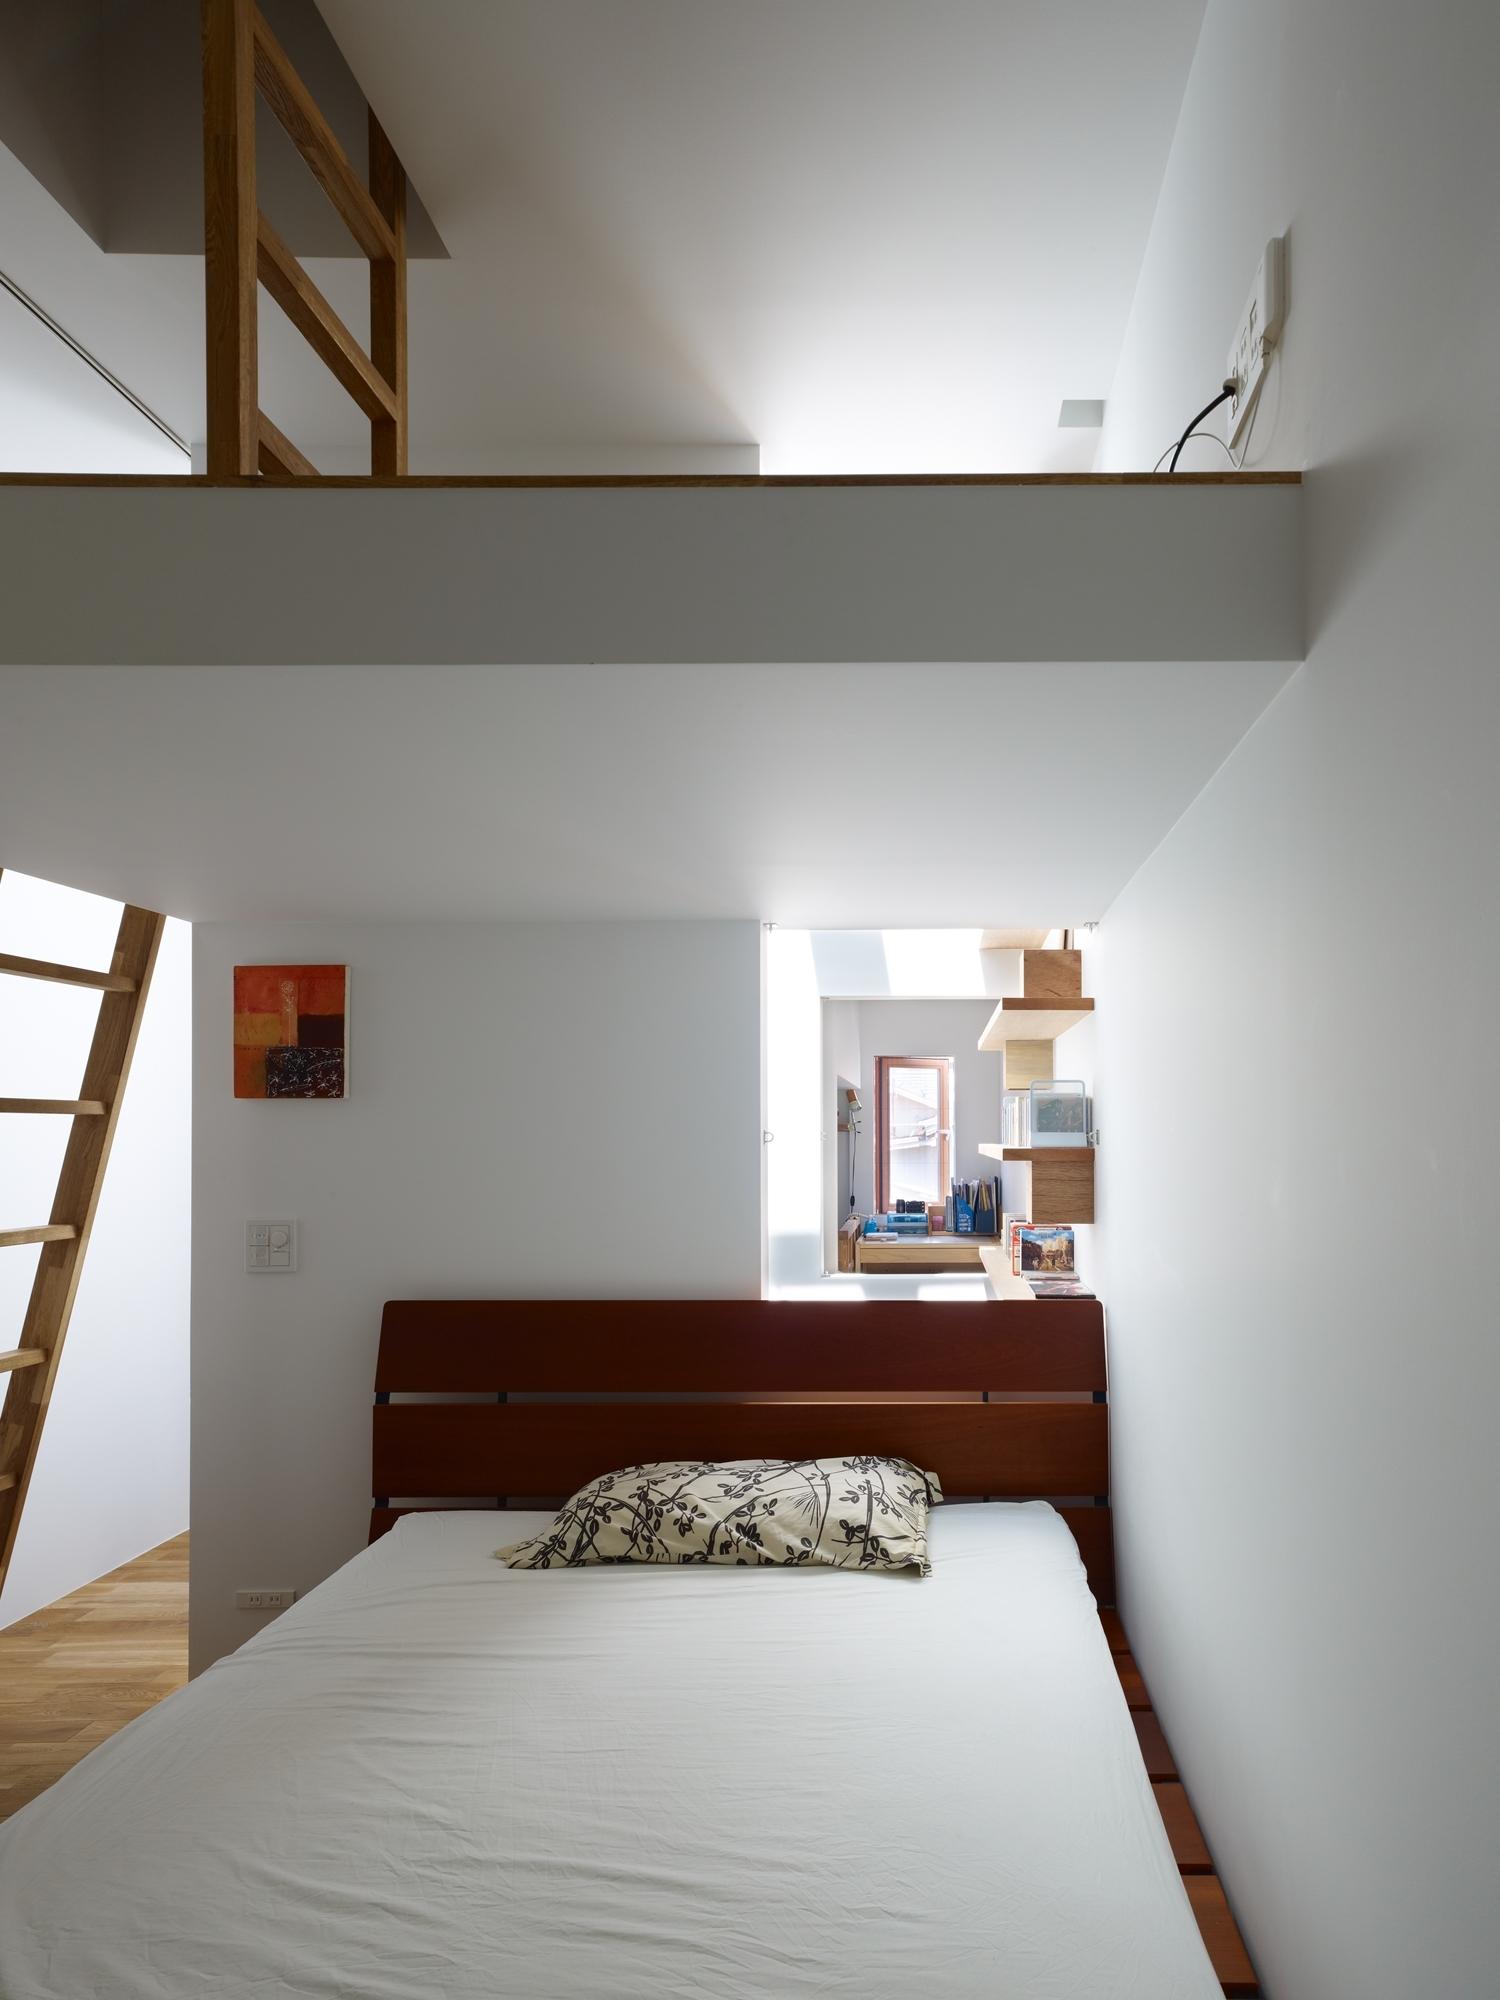 5144f285b3fc4bb1d8000076_house-in-nada-fujiwarramuro-architects_oishi216252000